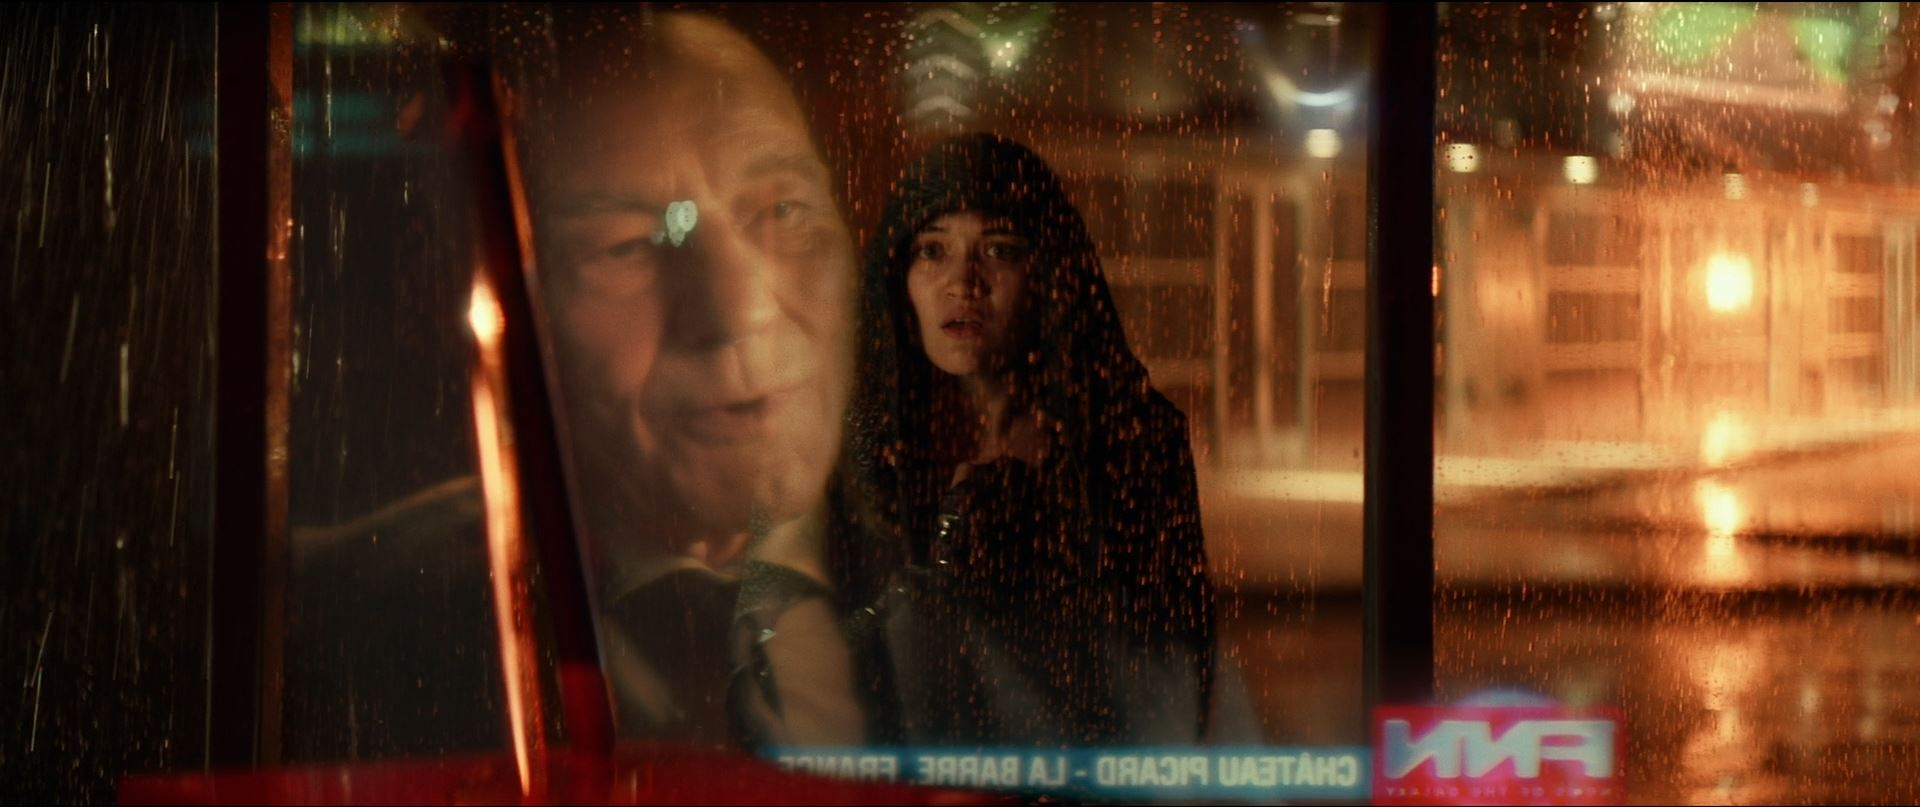 Star Trek Picard - Dasj watches Picard giving an interview